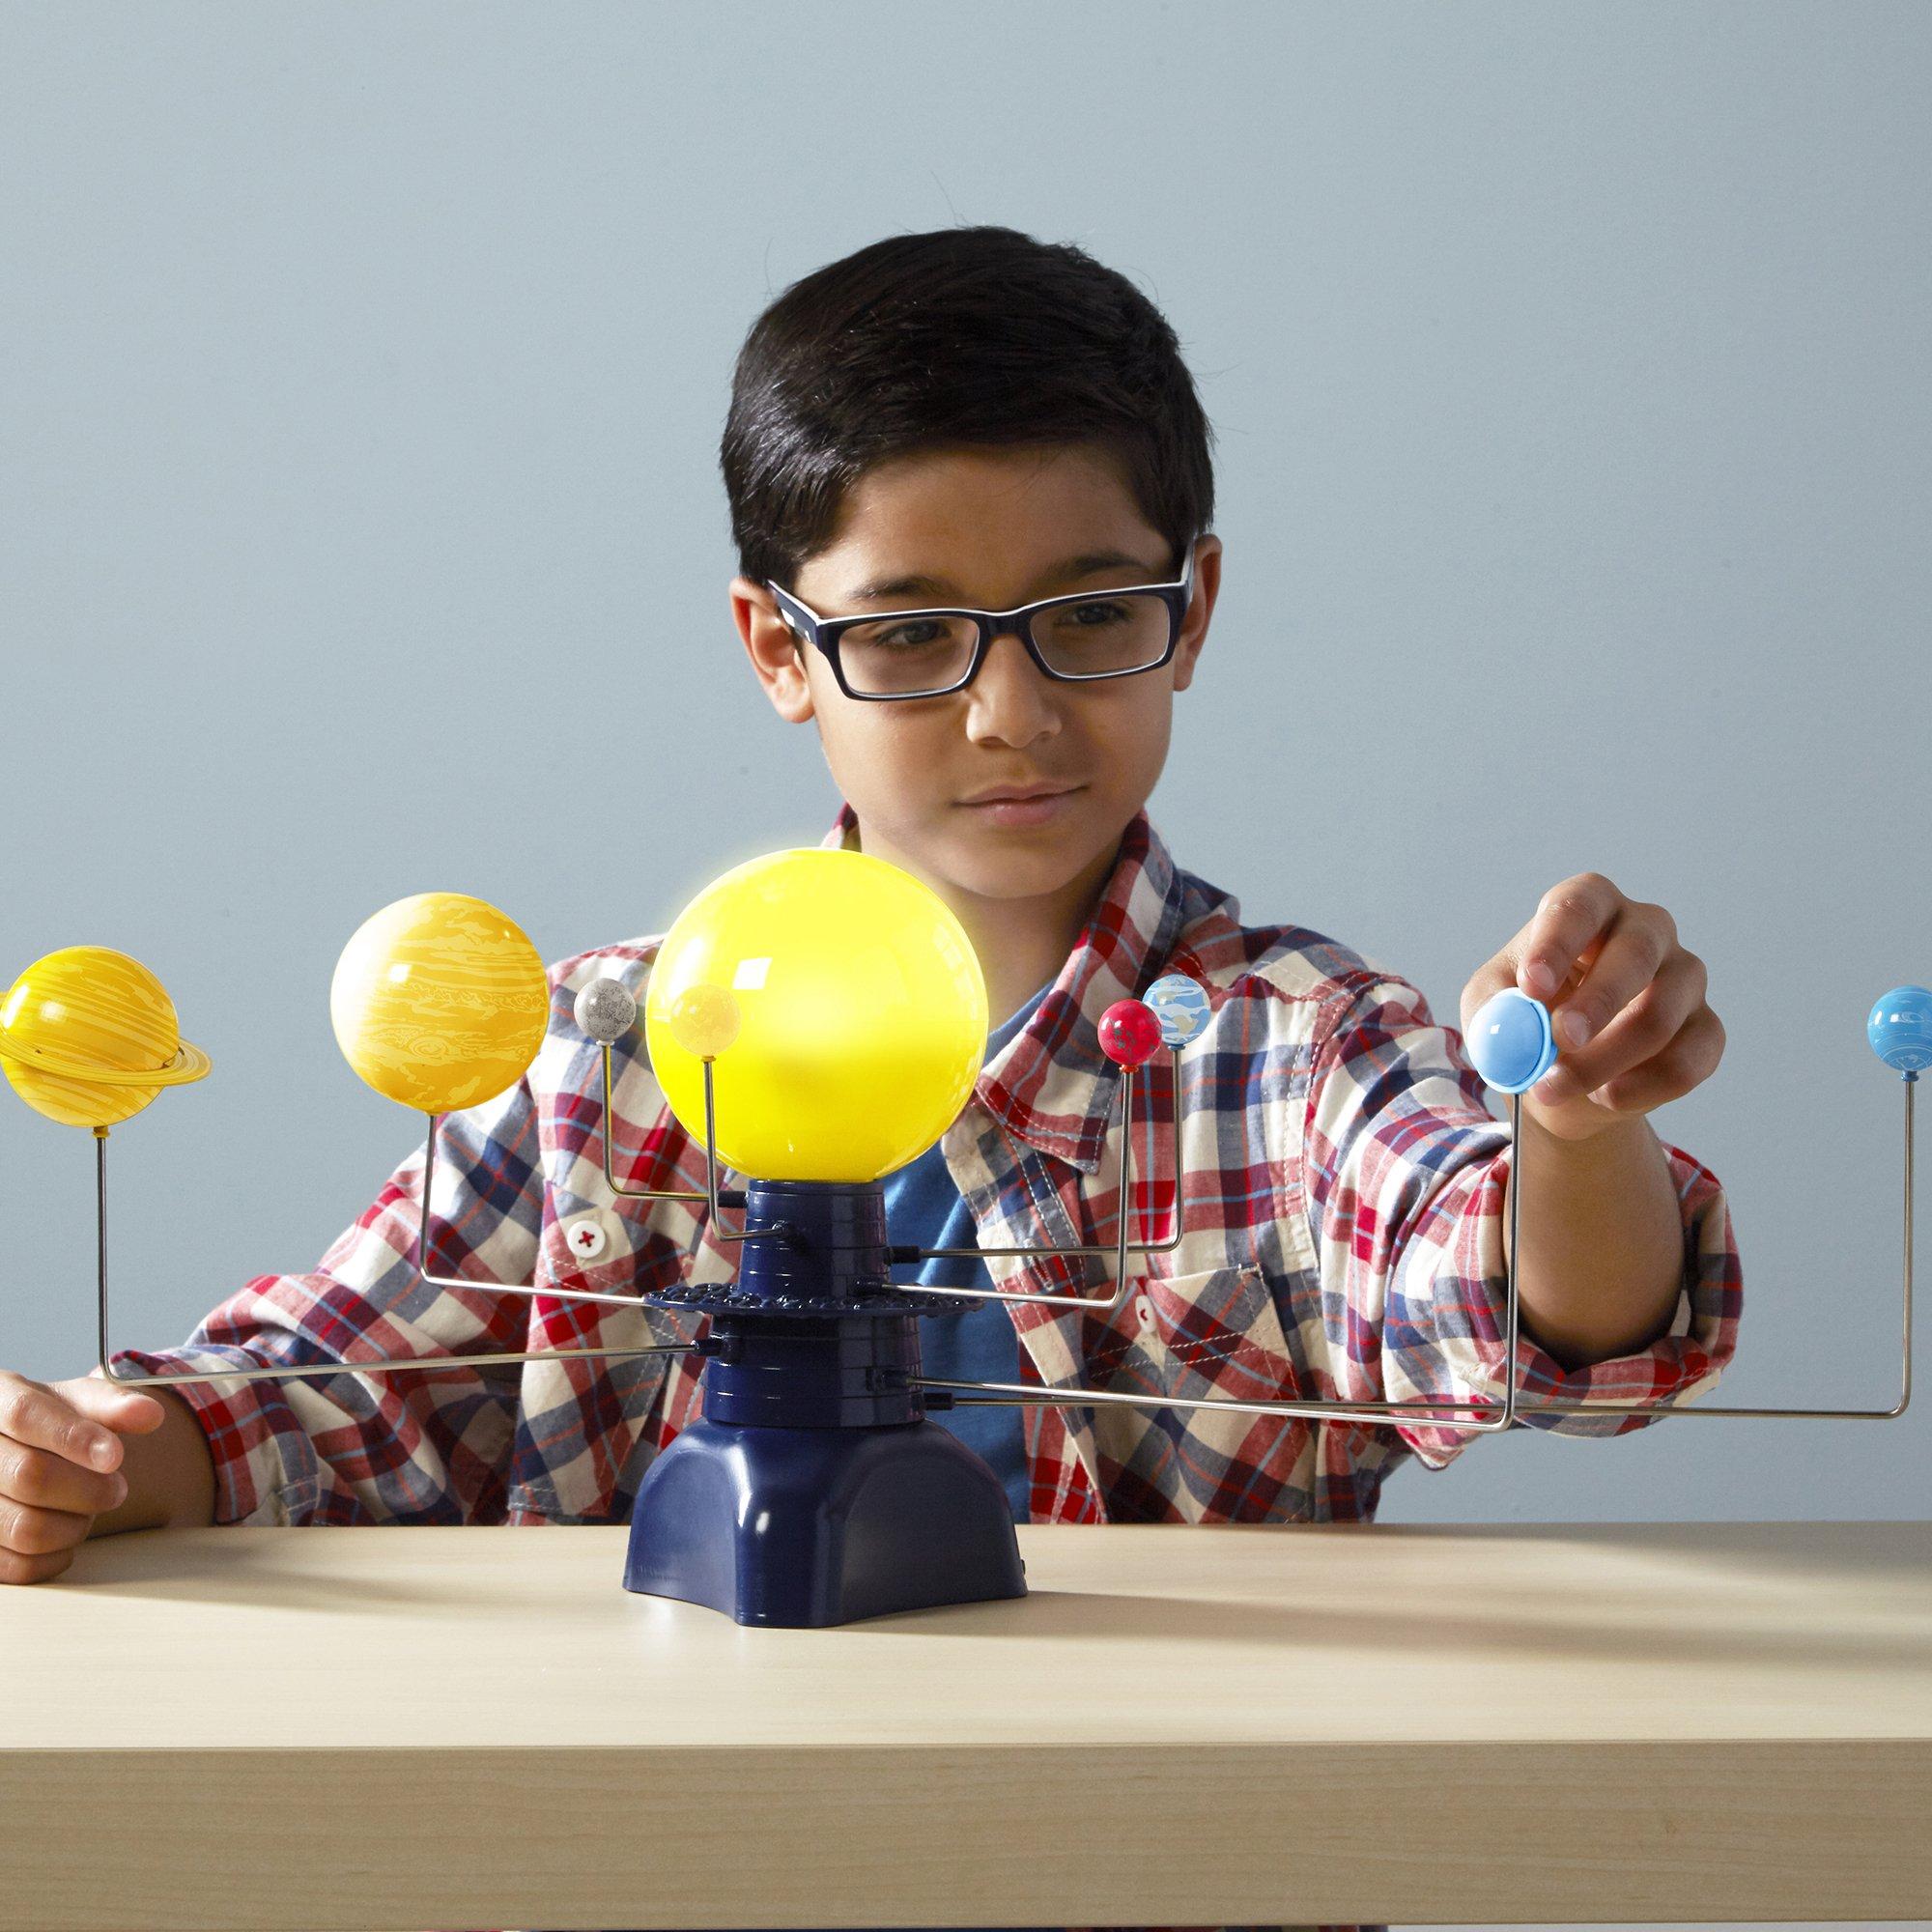 Educational Insights Geosafari Motorized Solar System Science Kit by Educational Insights (Image #2)